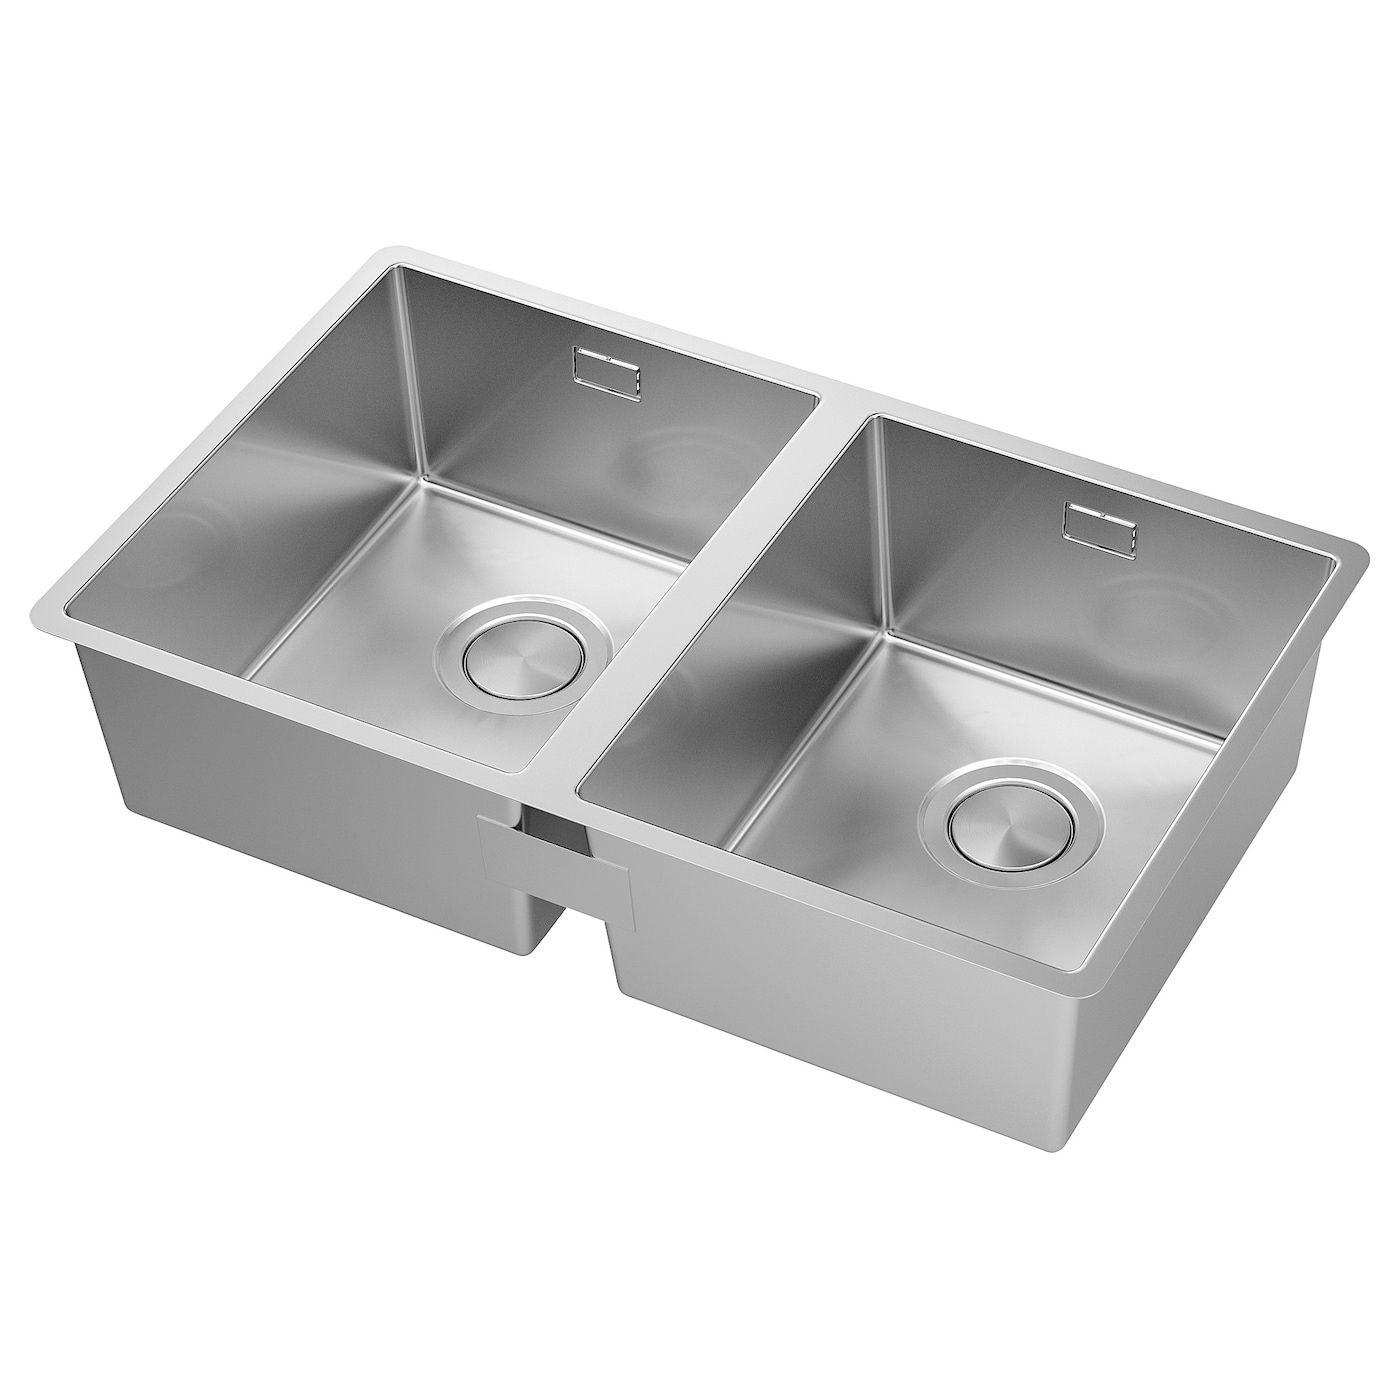 Norrsjon Inset Sink 2 Bowls Stainless Steel 73x44 Cm In 2020 Double Bowl Sink Inset Sink Bowl Sink